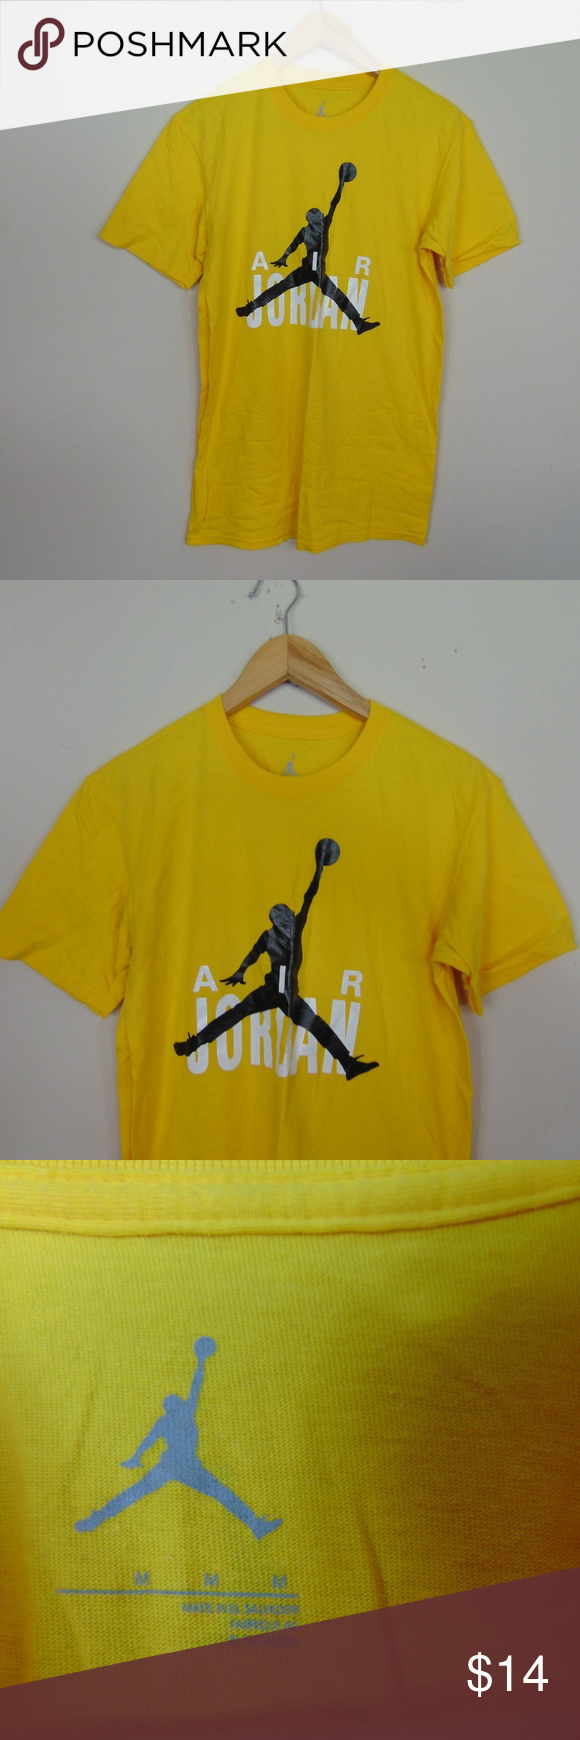 2886576136af26 Jordan Mens M Short Sleeve Graphic T-Shirt Yellow Air Jordan Tee Basketball  Excellent condition